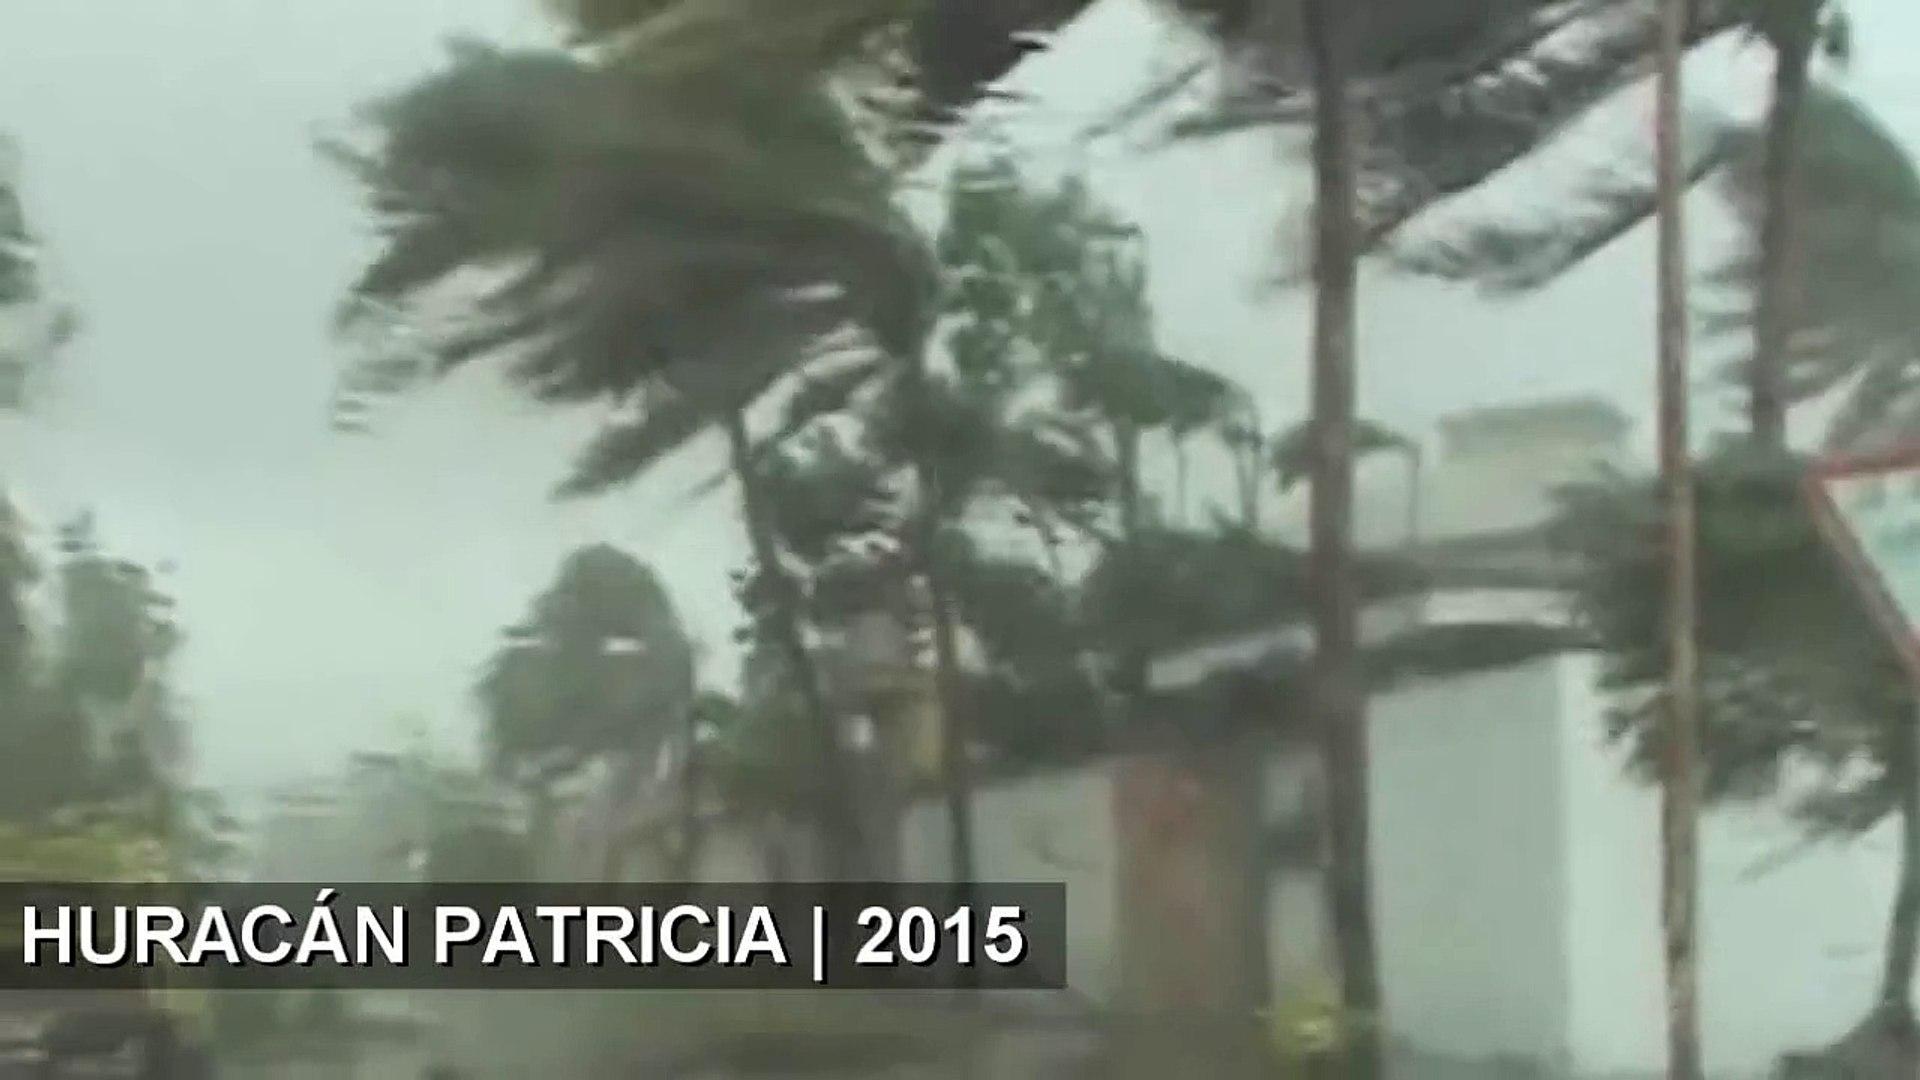 SORPRENDENTE - Toca tierra el huracán Patricia en México | MOMENTO EXACTO • 23.10.2015